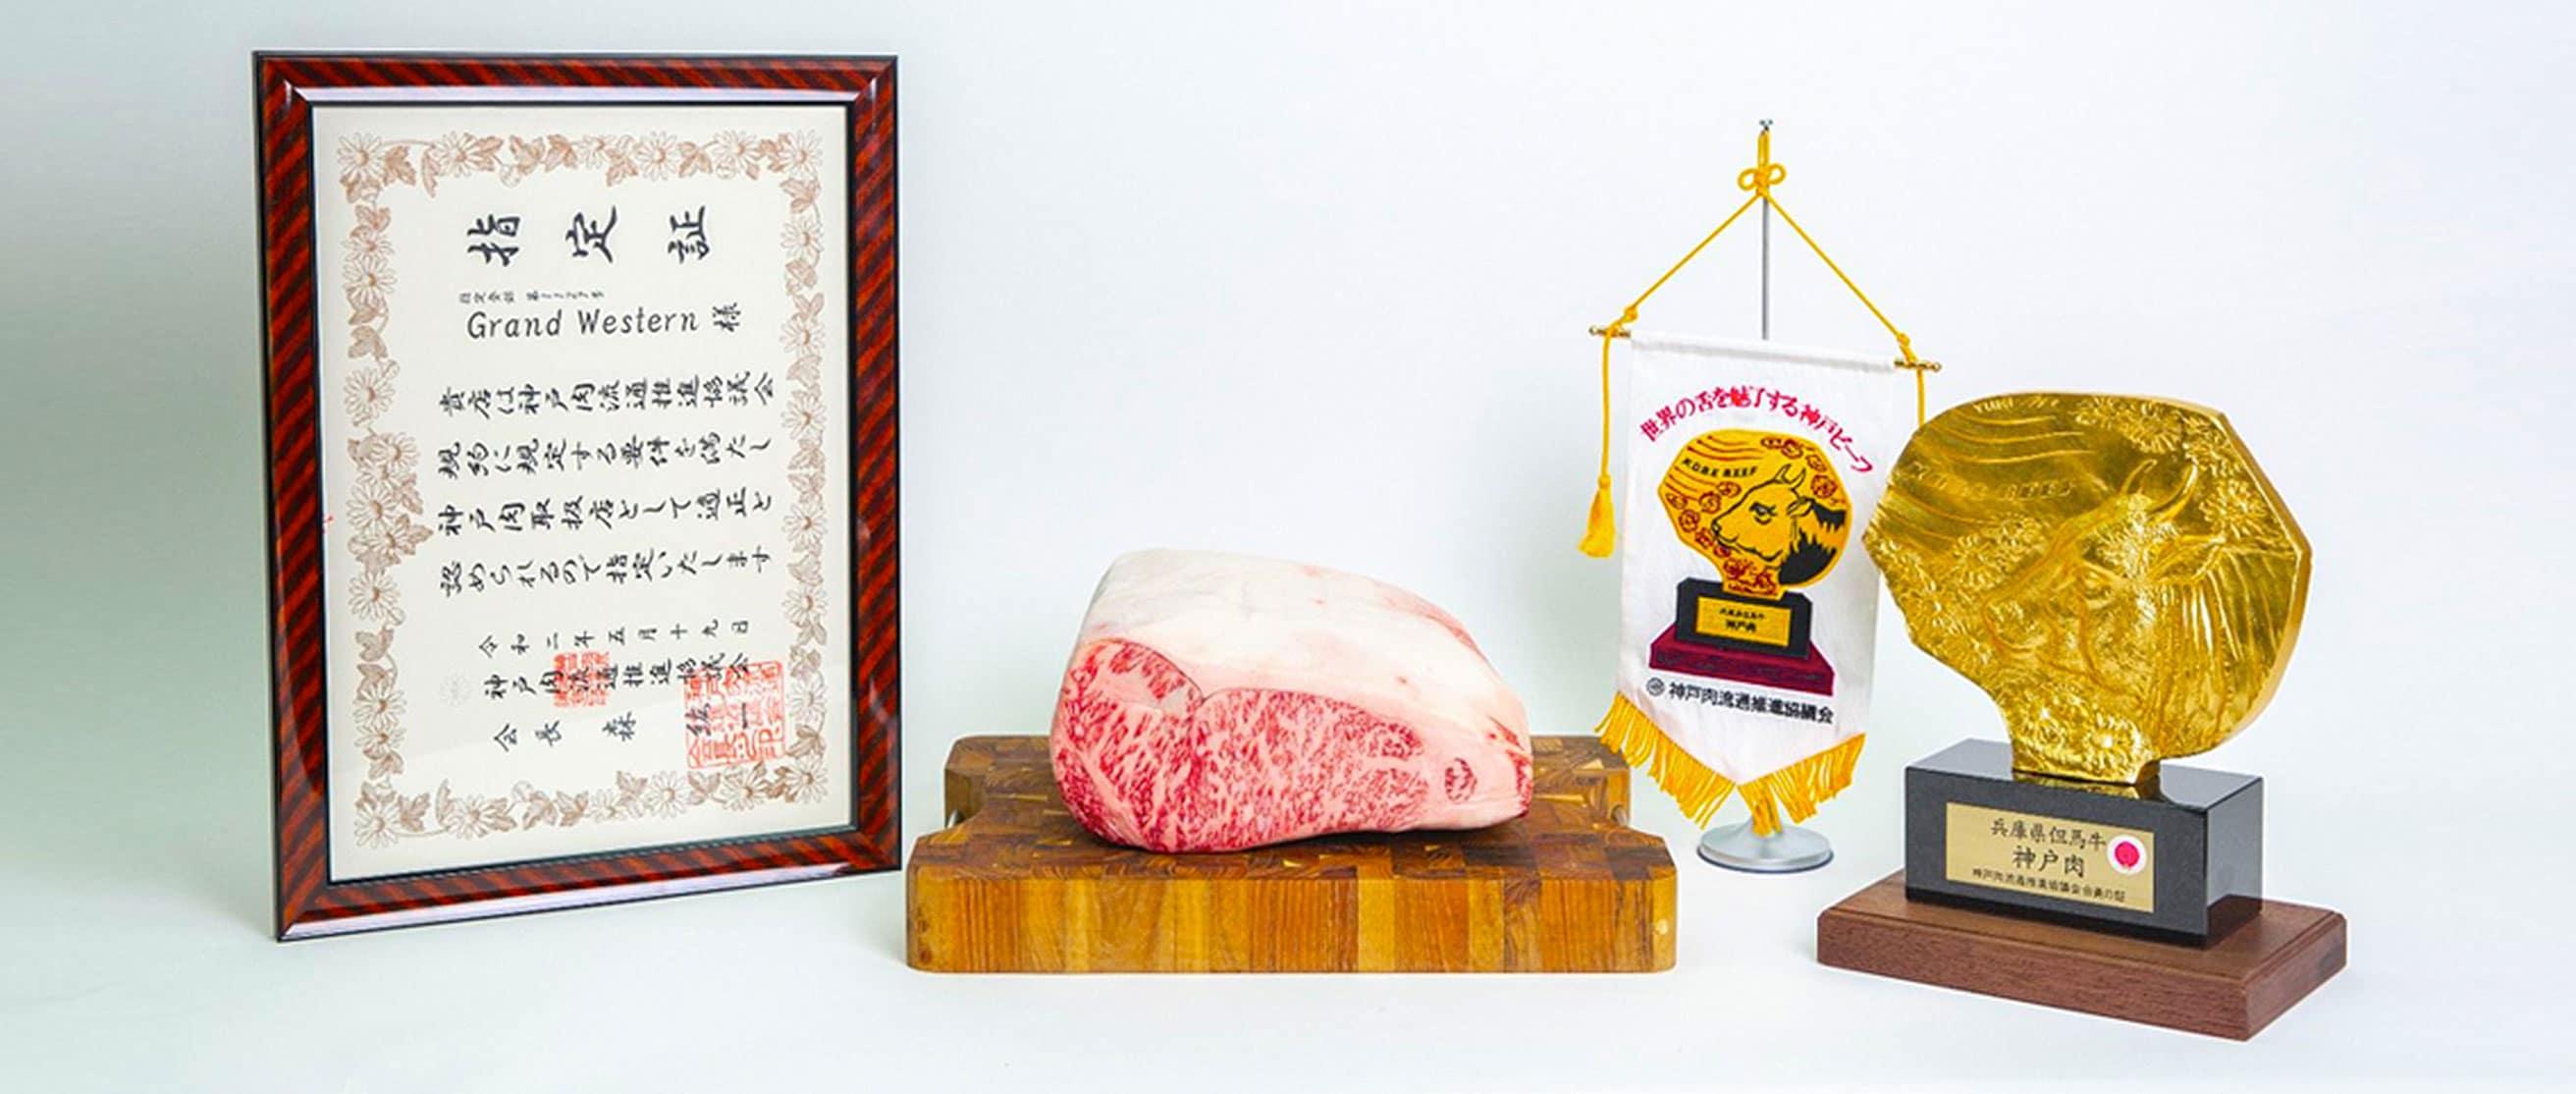 grand-western-steaks-absolute-web-banner